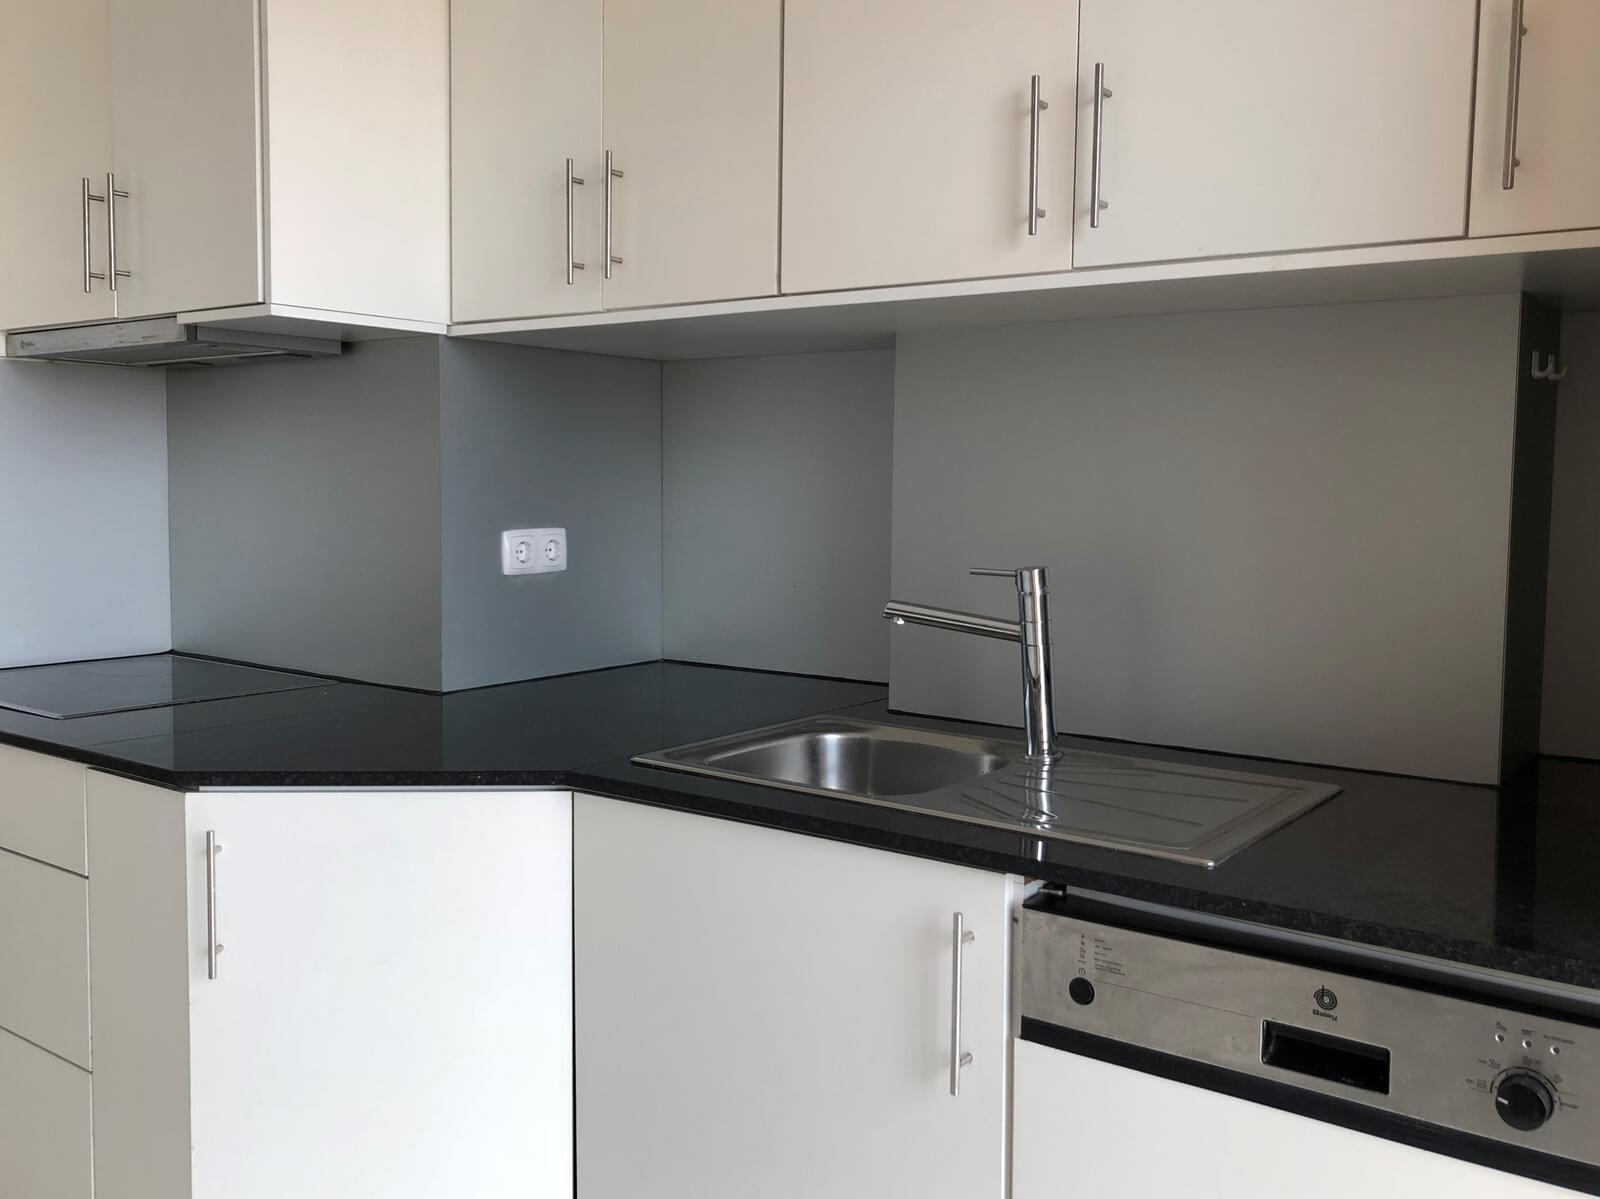 pf18040-apartamento-t3-lisboa-e75640d7-3fef-43a9-aafc-2fcb99964f54